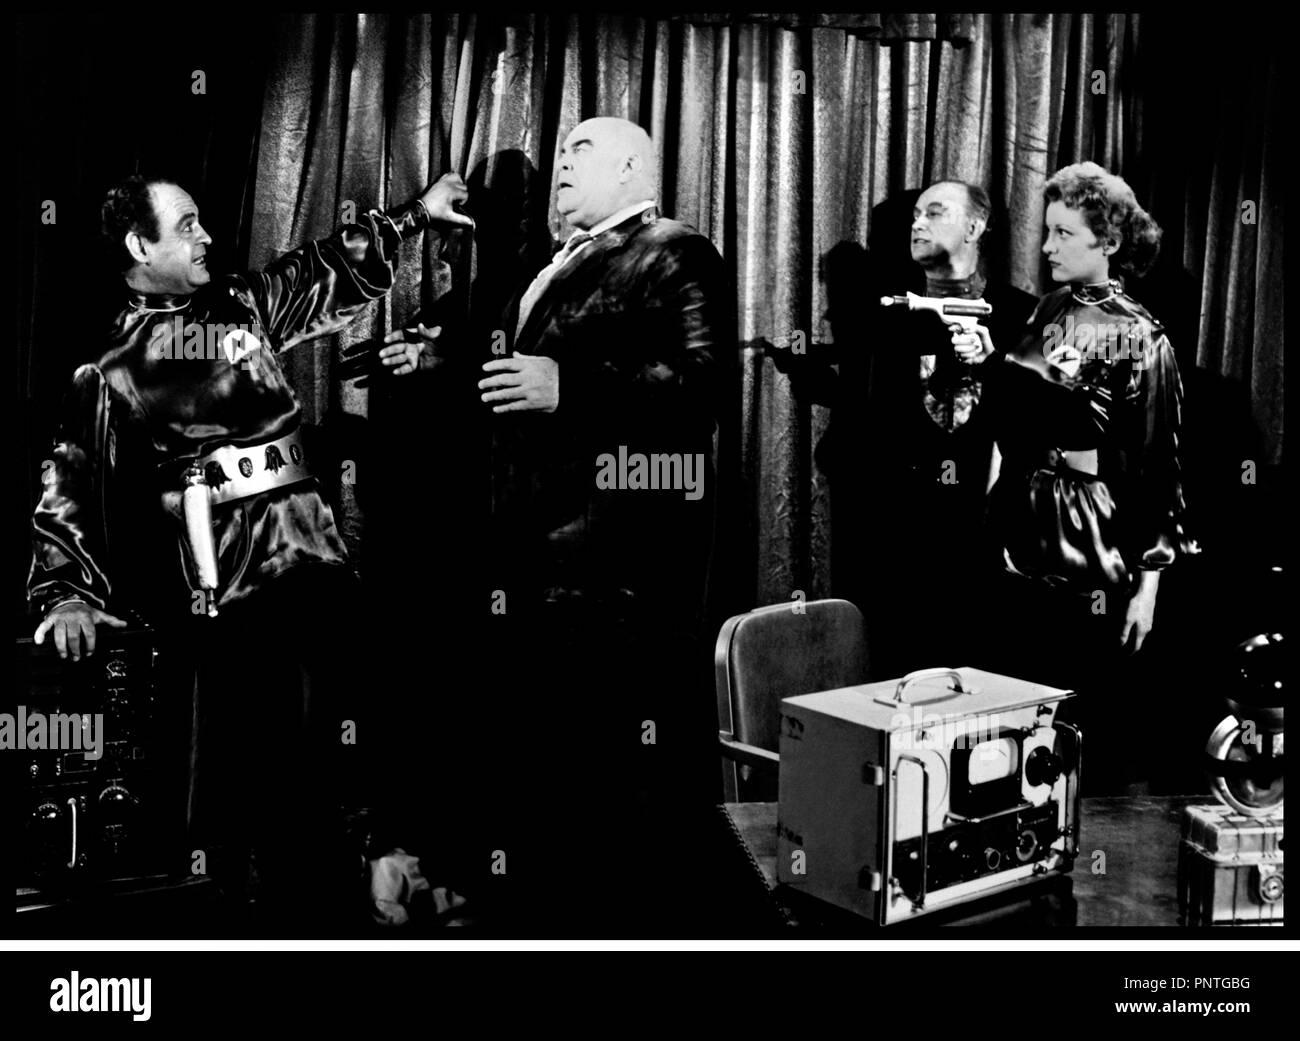 Prod DB © Reynolds Pictures / DR PLAN 9 FROM OUTER SPACE (PLAN 9 FROM OUTER SPACE) de Ed Wood 1958 USA avec Tor Johnson et Tanna transe, hypnose, science-fiction, sŽrie B, pistolet laser,  rŽalisateur: Edward D. Wood Jr - Stock Image